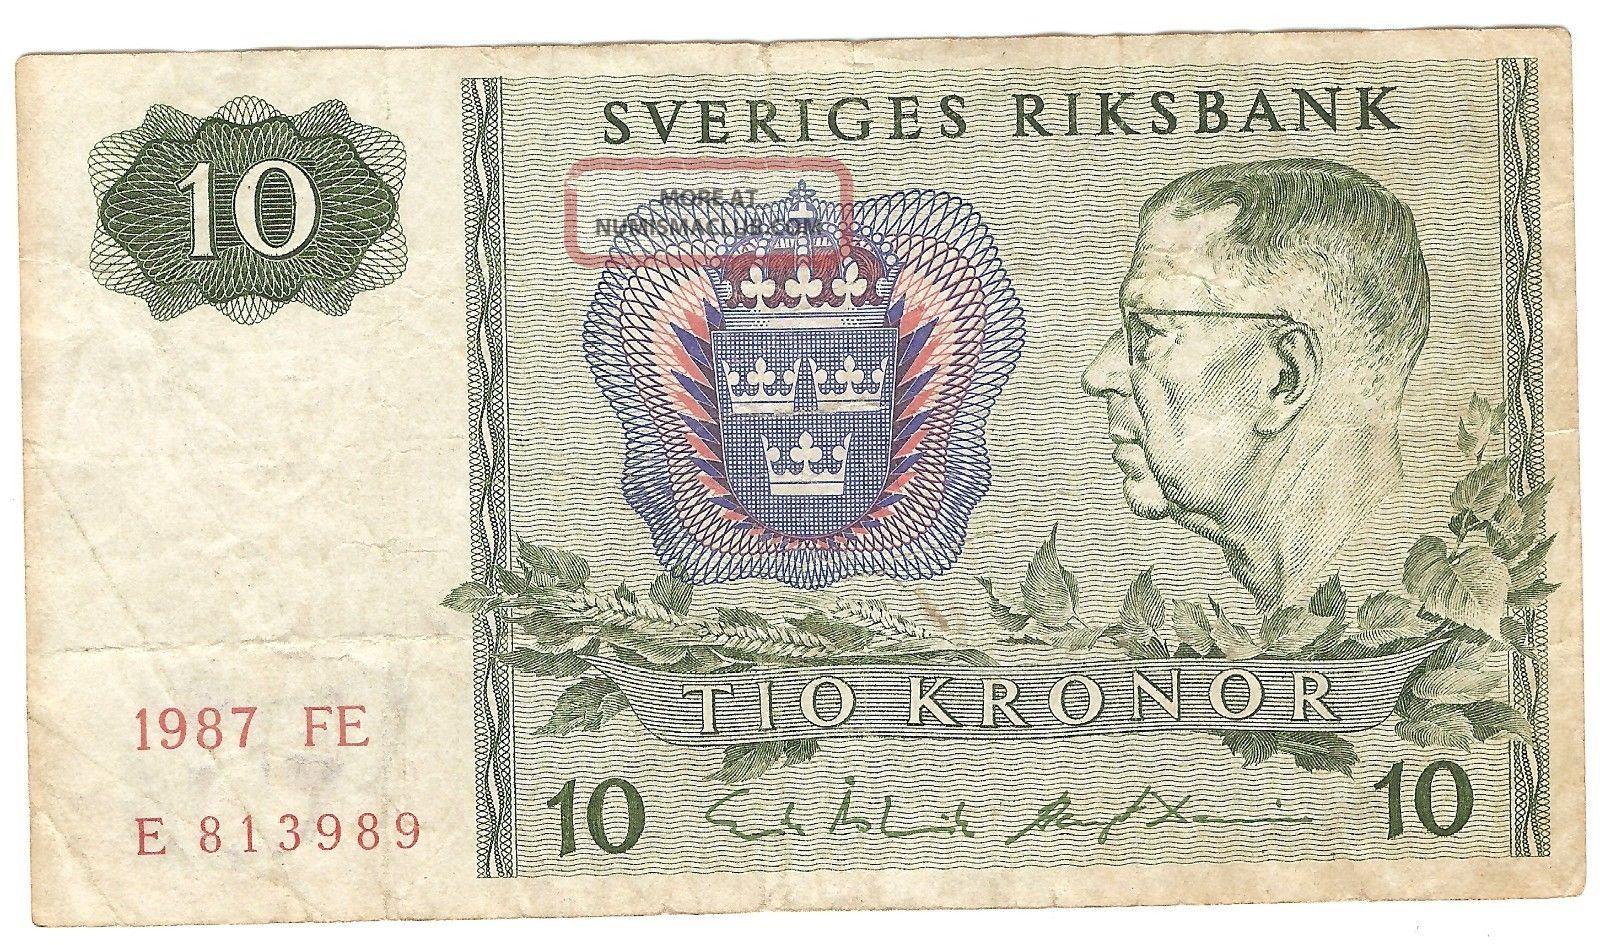 10 Kroner From Sweden 1987 Europe photo